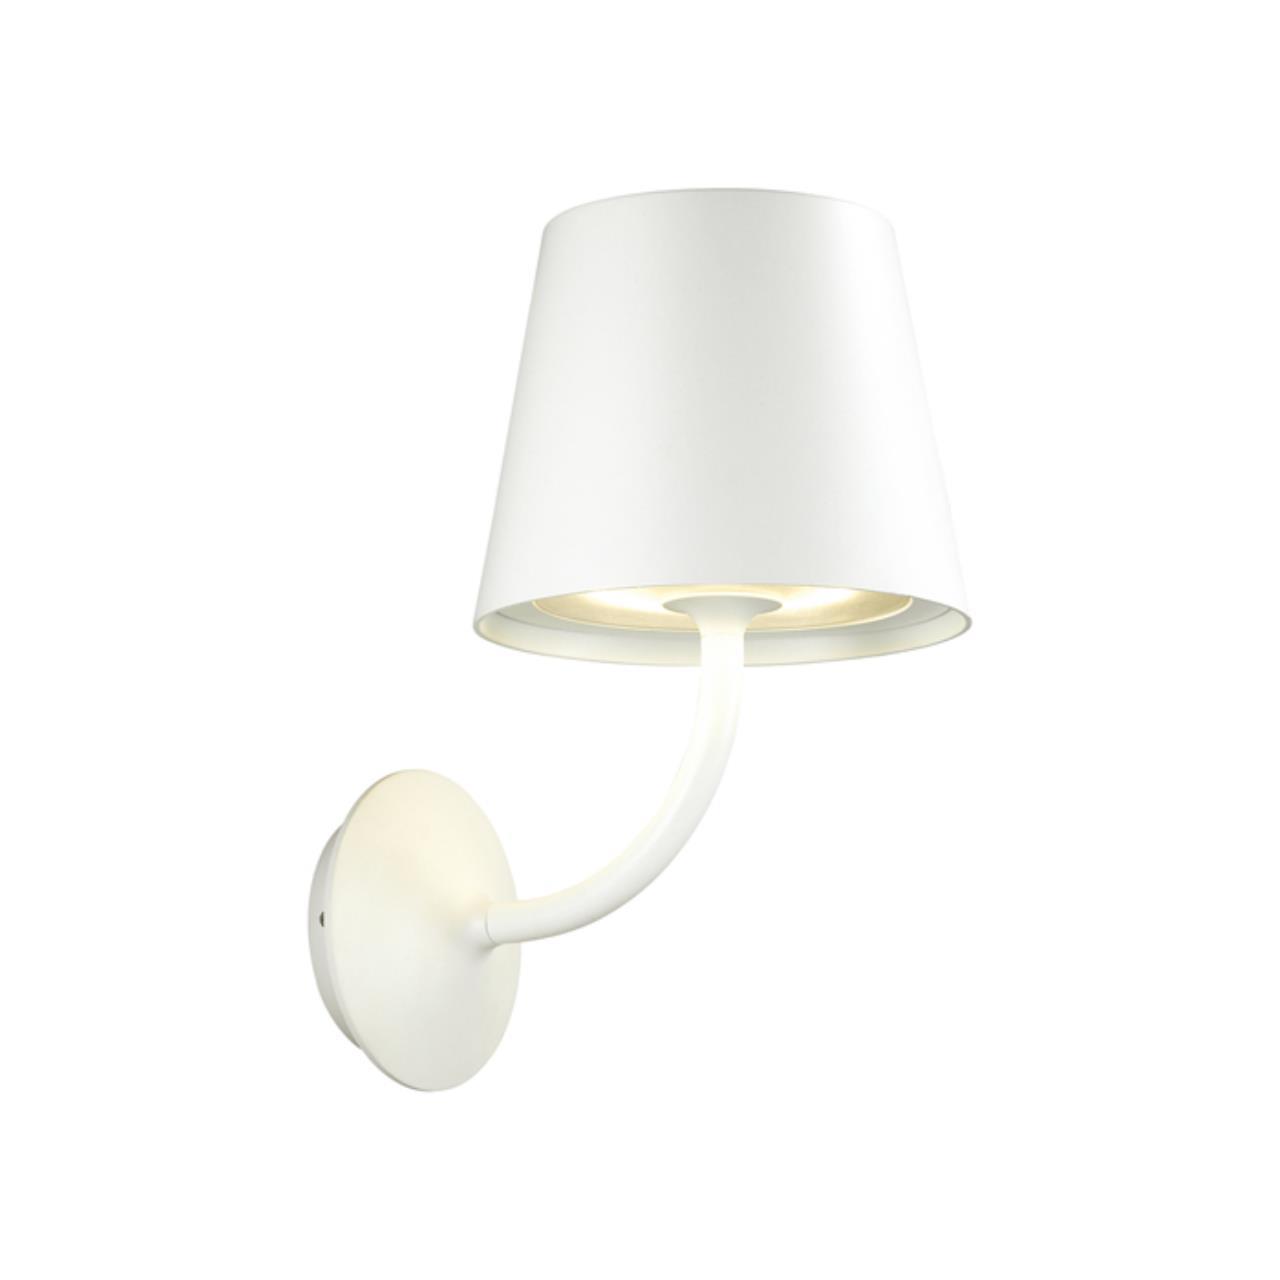 4609/7WL L-VISION ODL19 690 белый Уличный настенный светильник IP65 LED 7W ELIN